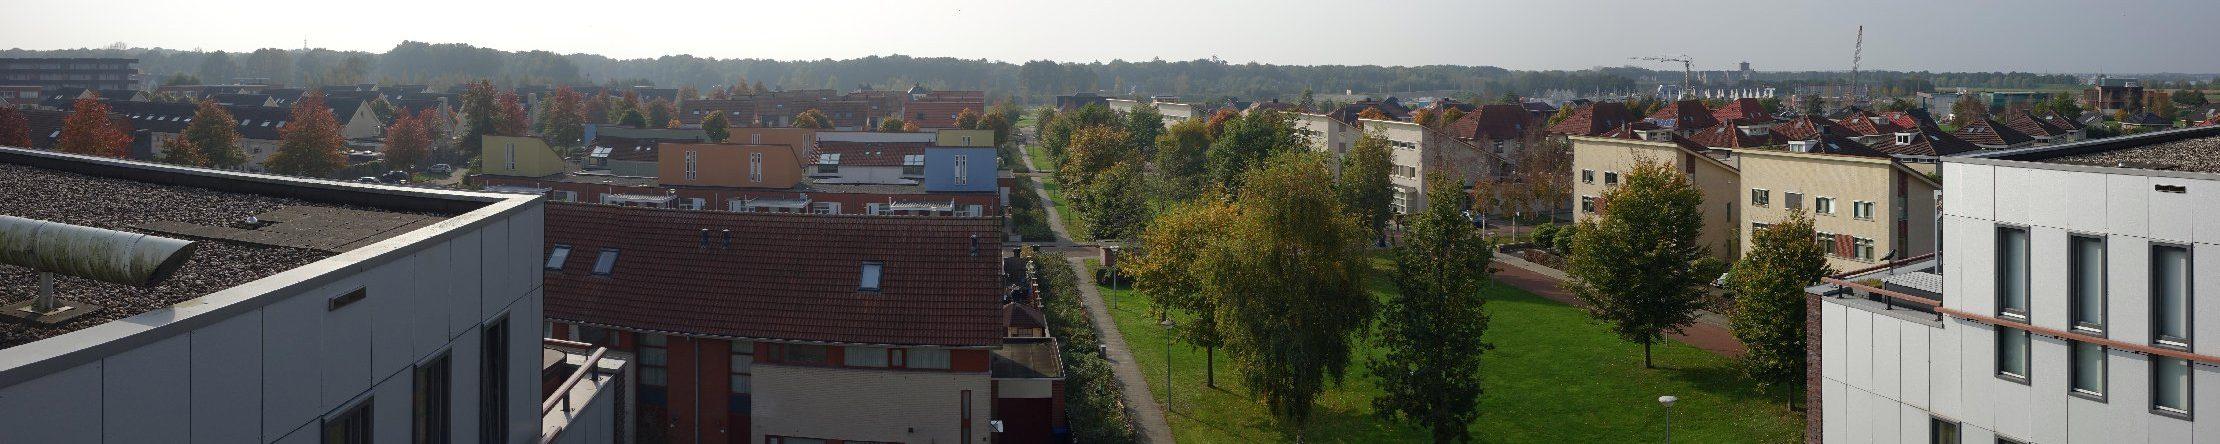 Webplek van Henk W. Pol